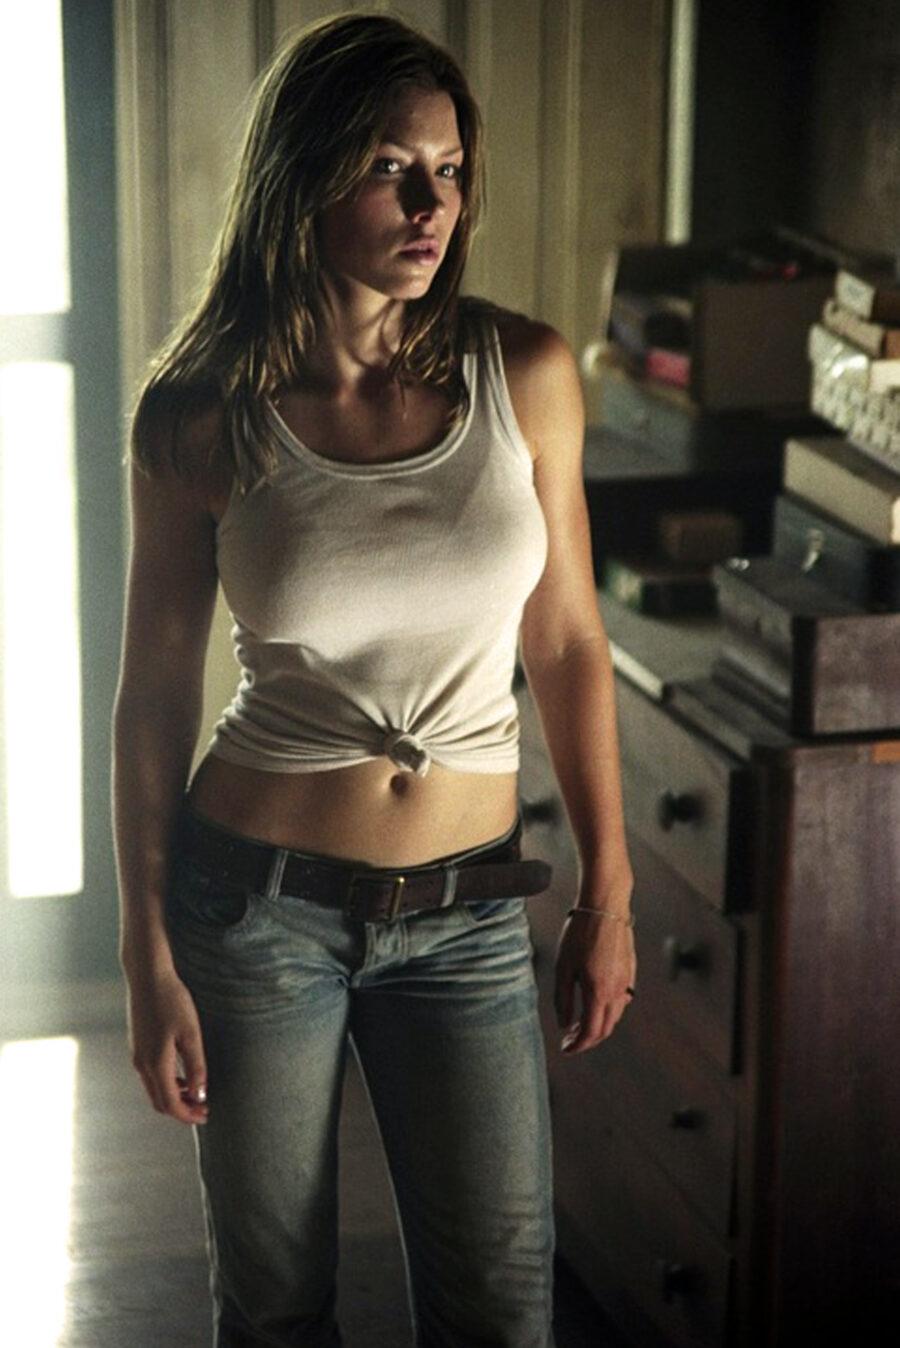 Jessica Biel in Texas Chainsaw